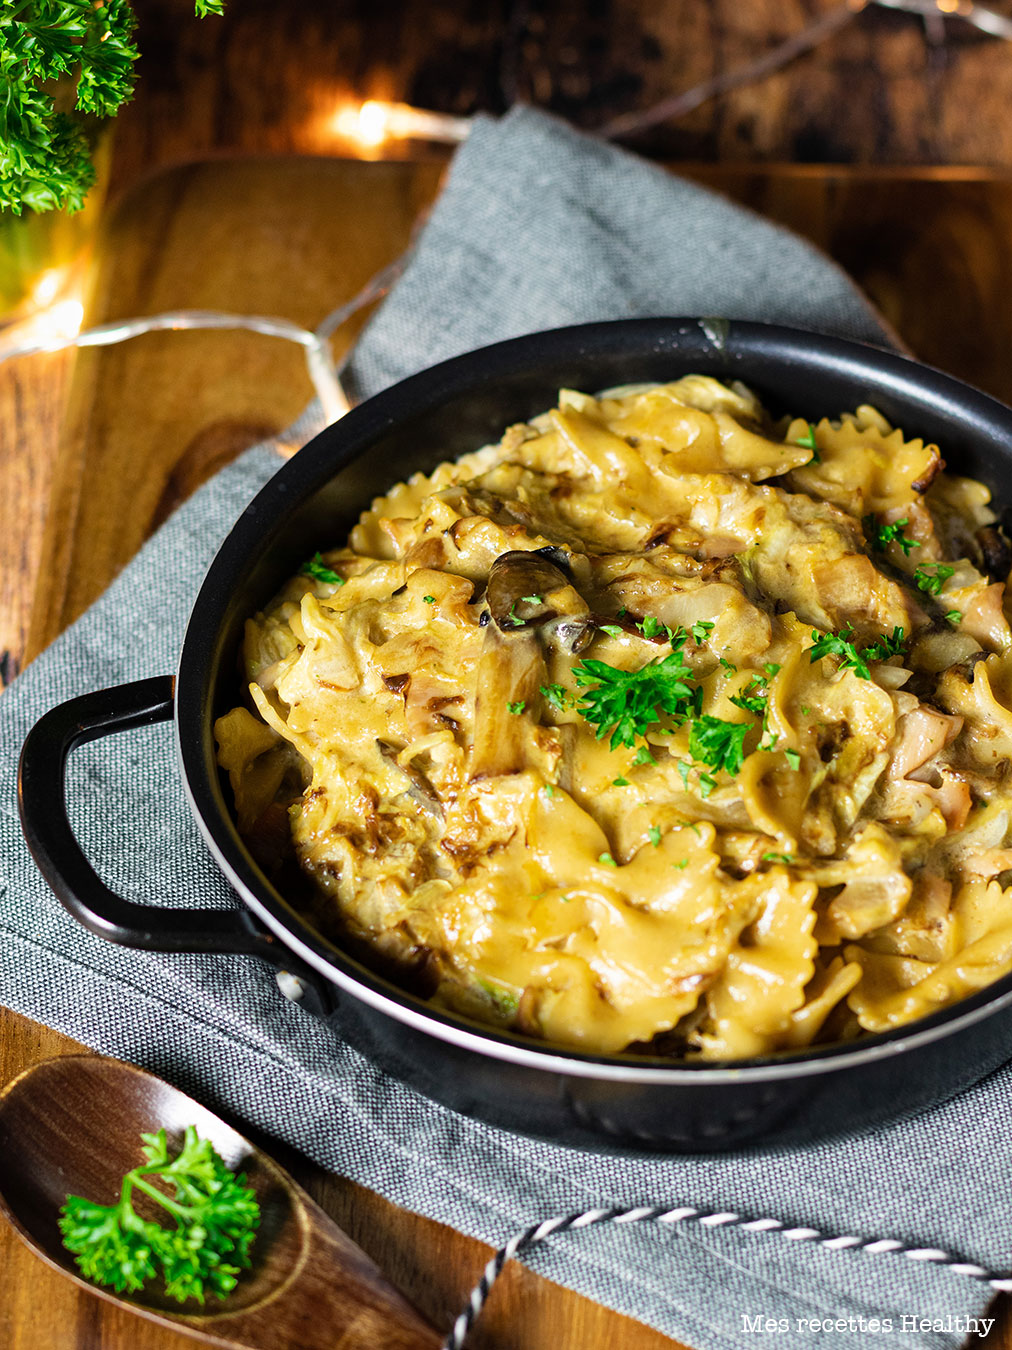 recette helathy-pate-chou creme-beaufort